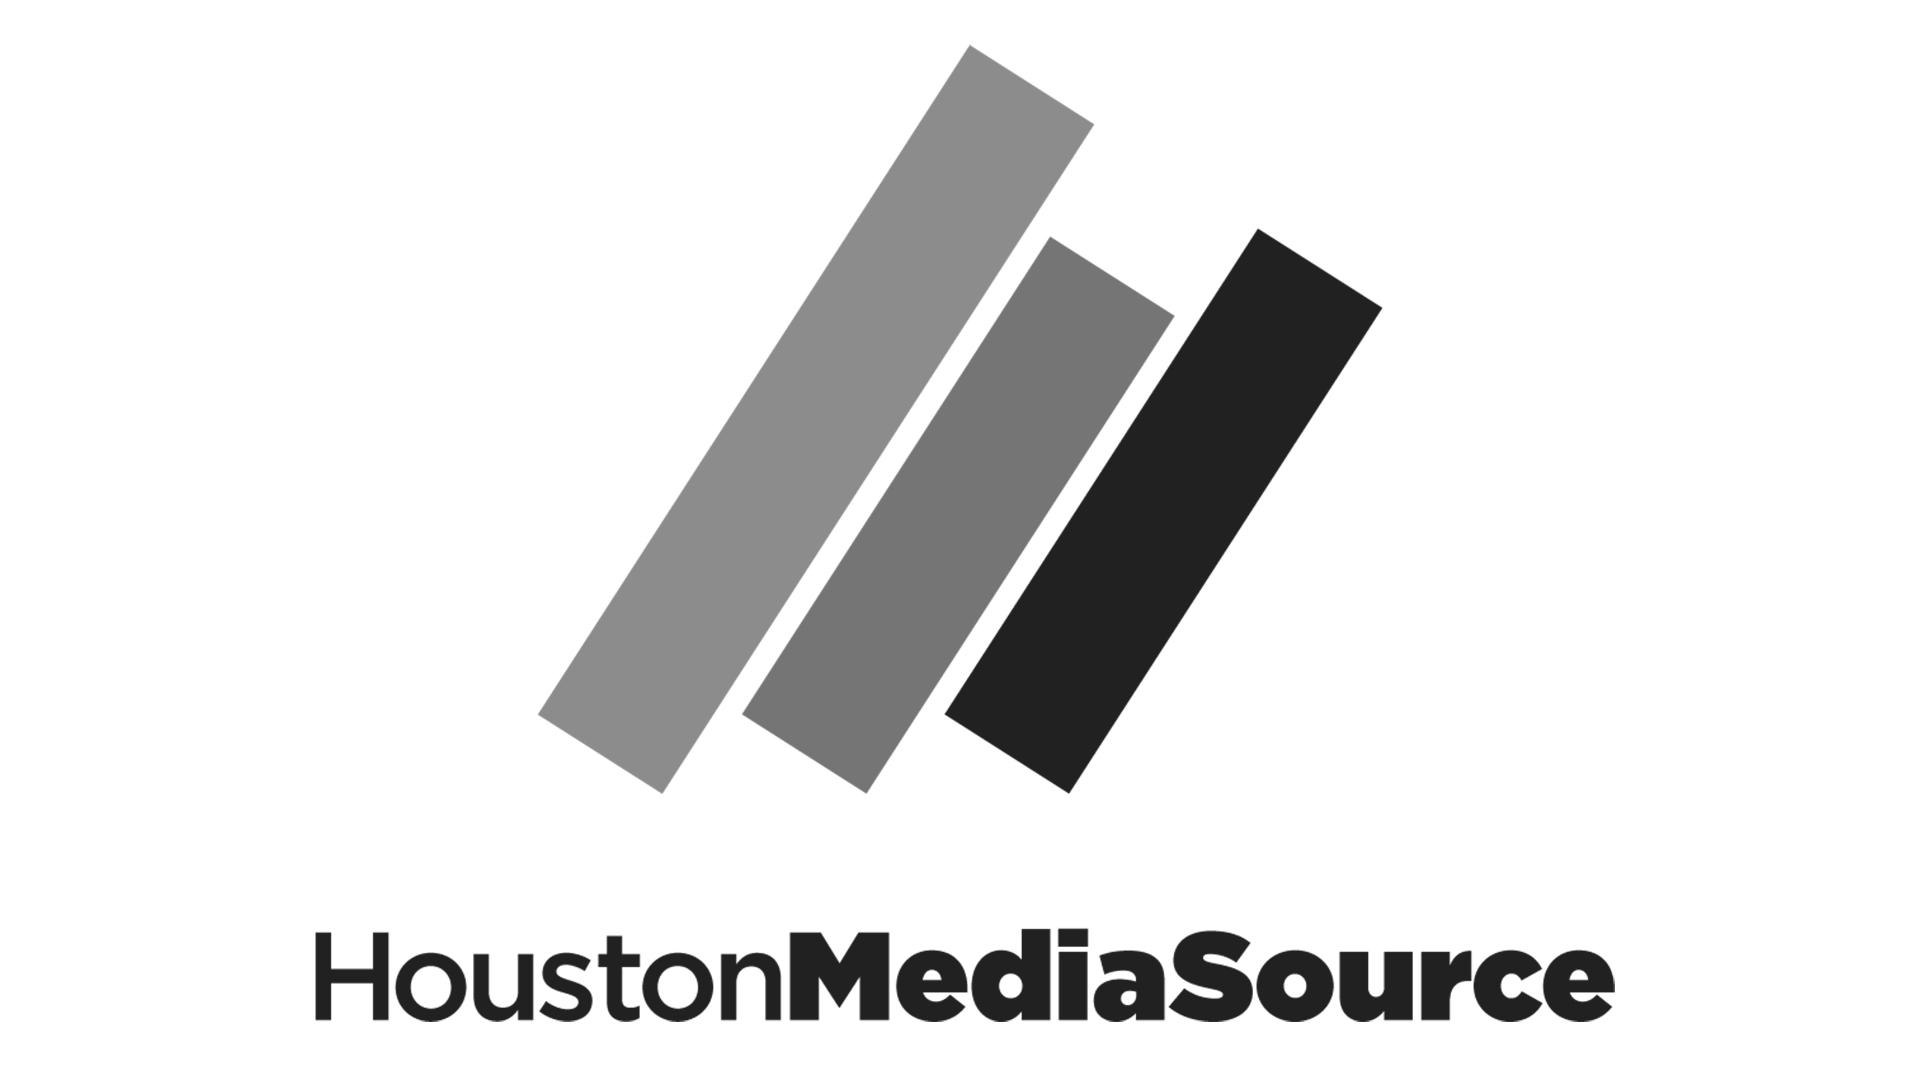 Houston Media Source_Web_1920x1080